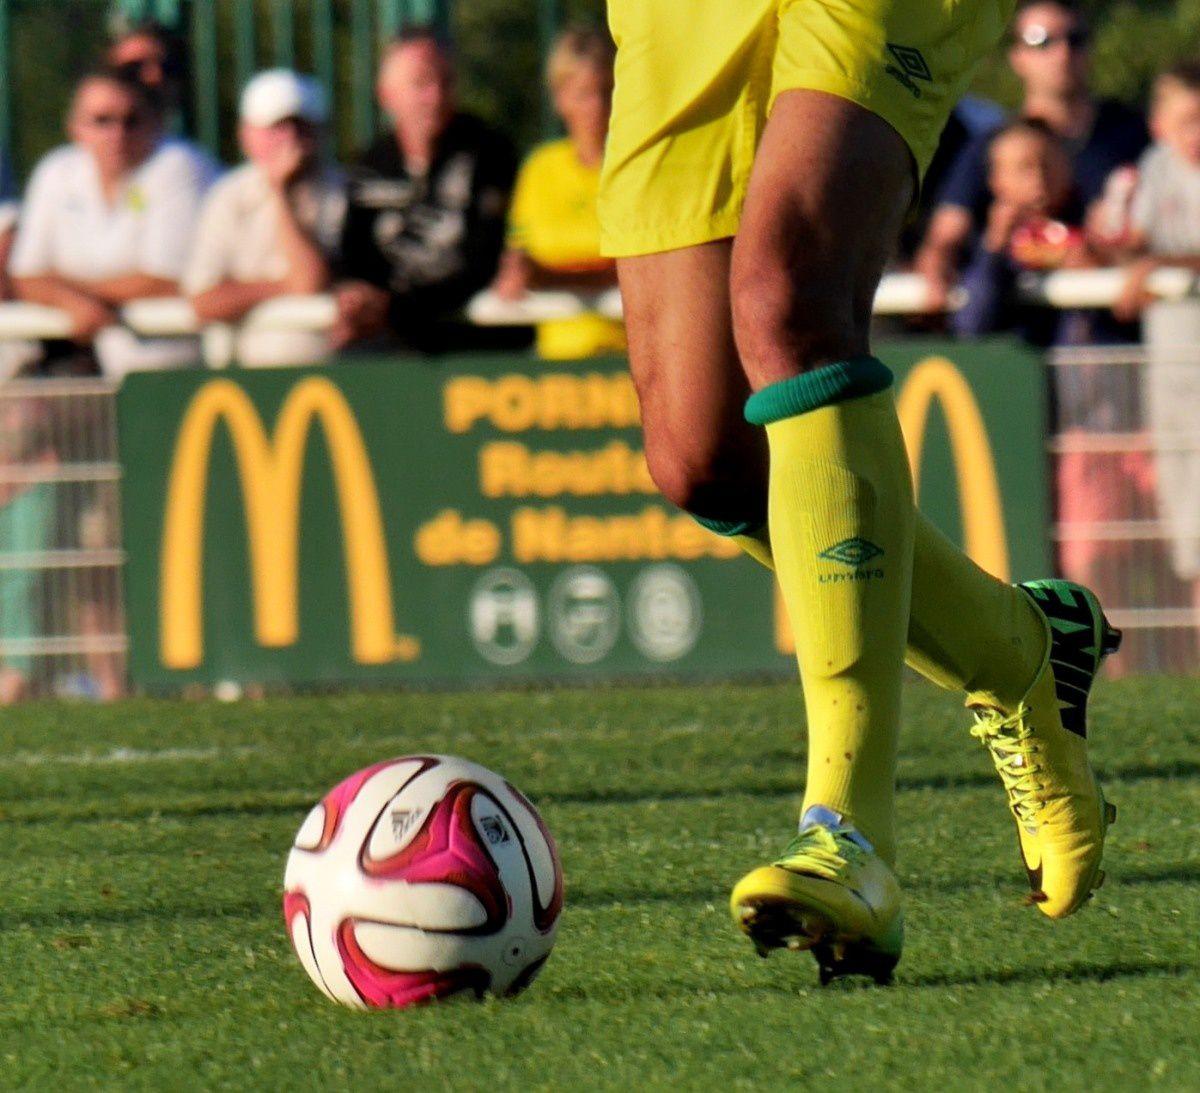 PORNIC : le match Nantes-Brest (06 fin)